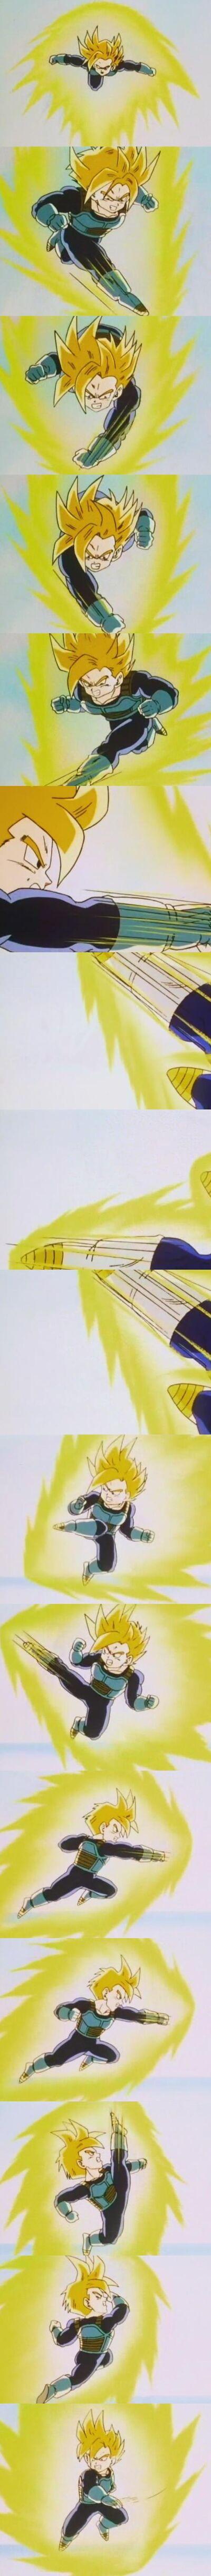 Gohan Teen Super Saiyan super 6